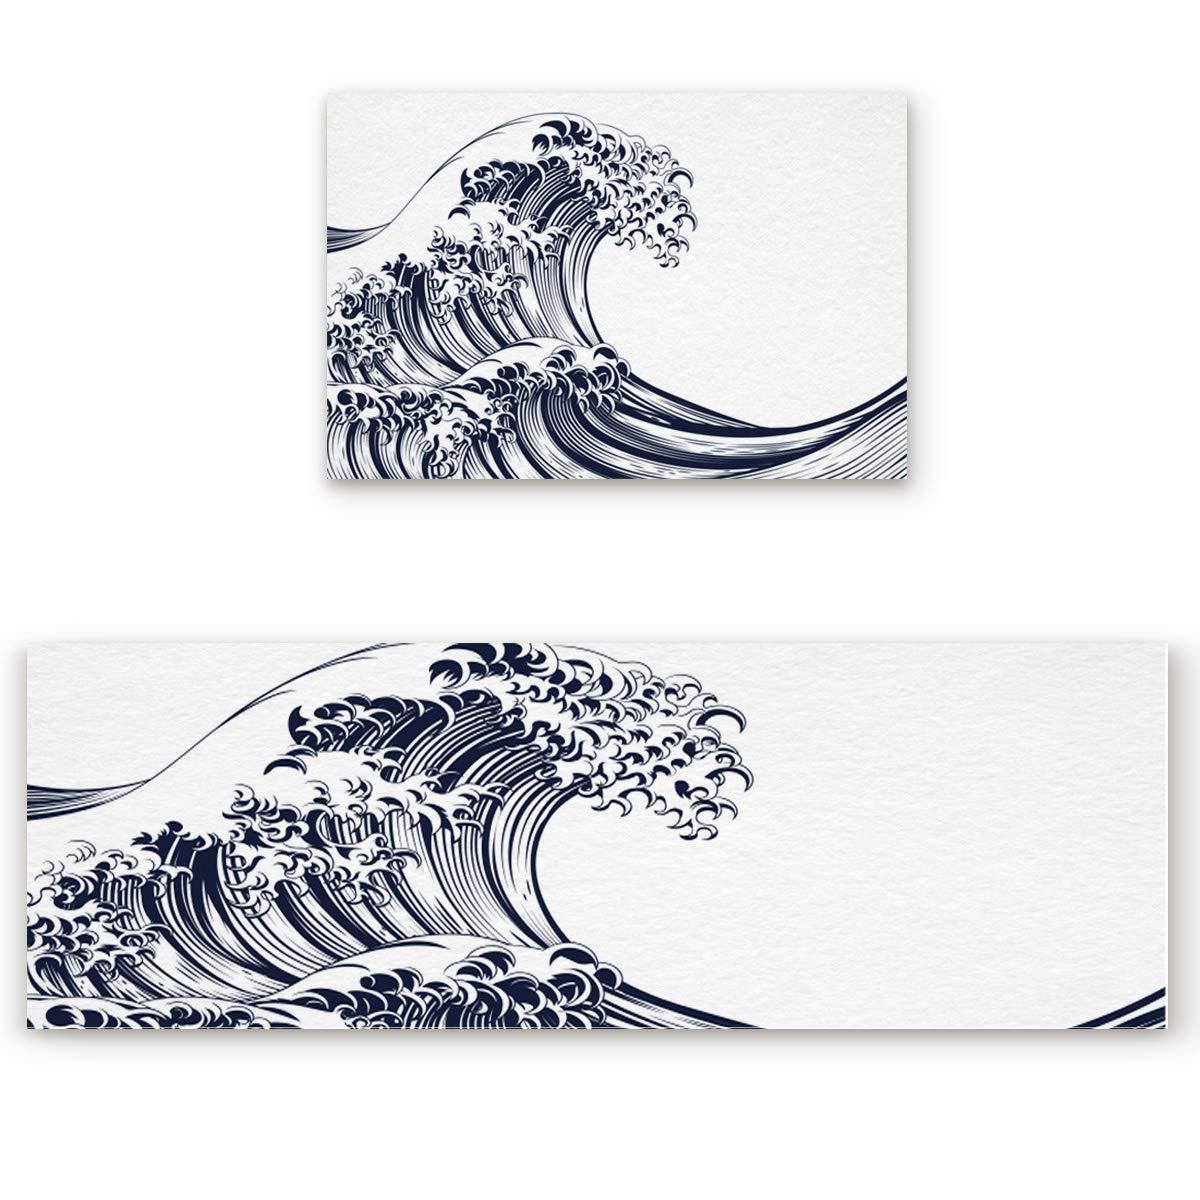 23.6x35.4in+23.6x70.9in Simple Design Door mat 2 Piece Set, Line Japanese Style Wave Spindrift Doormat Rug,Decorative Felt Floor Mat with Non-Skid Backing,Fit for Indoor,Kitchen,Bedroom (23.6x35.4in+23.6x70.9in)